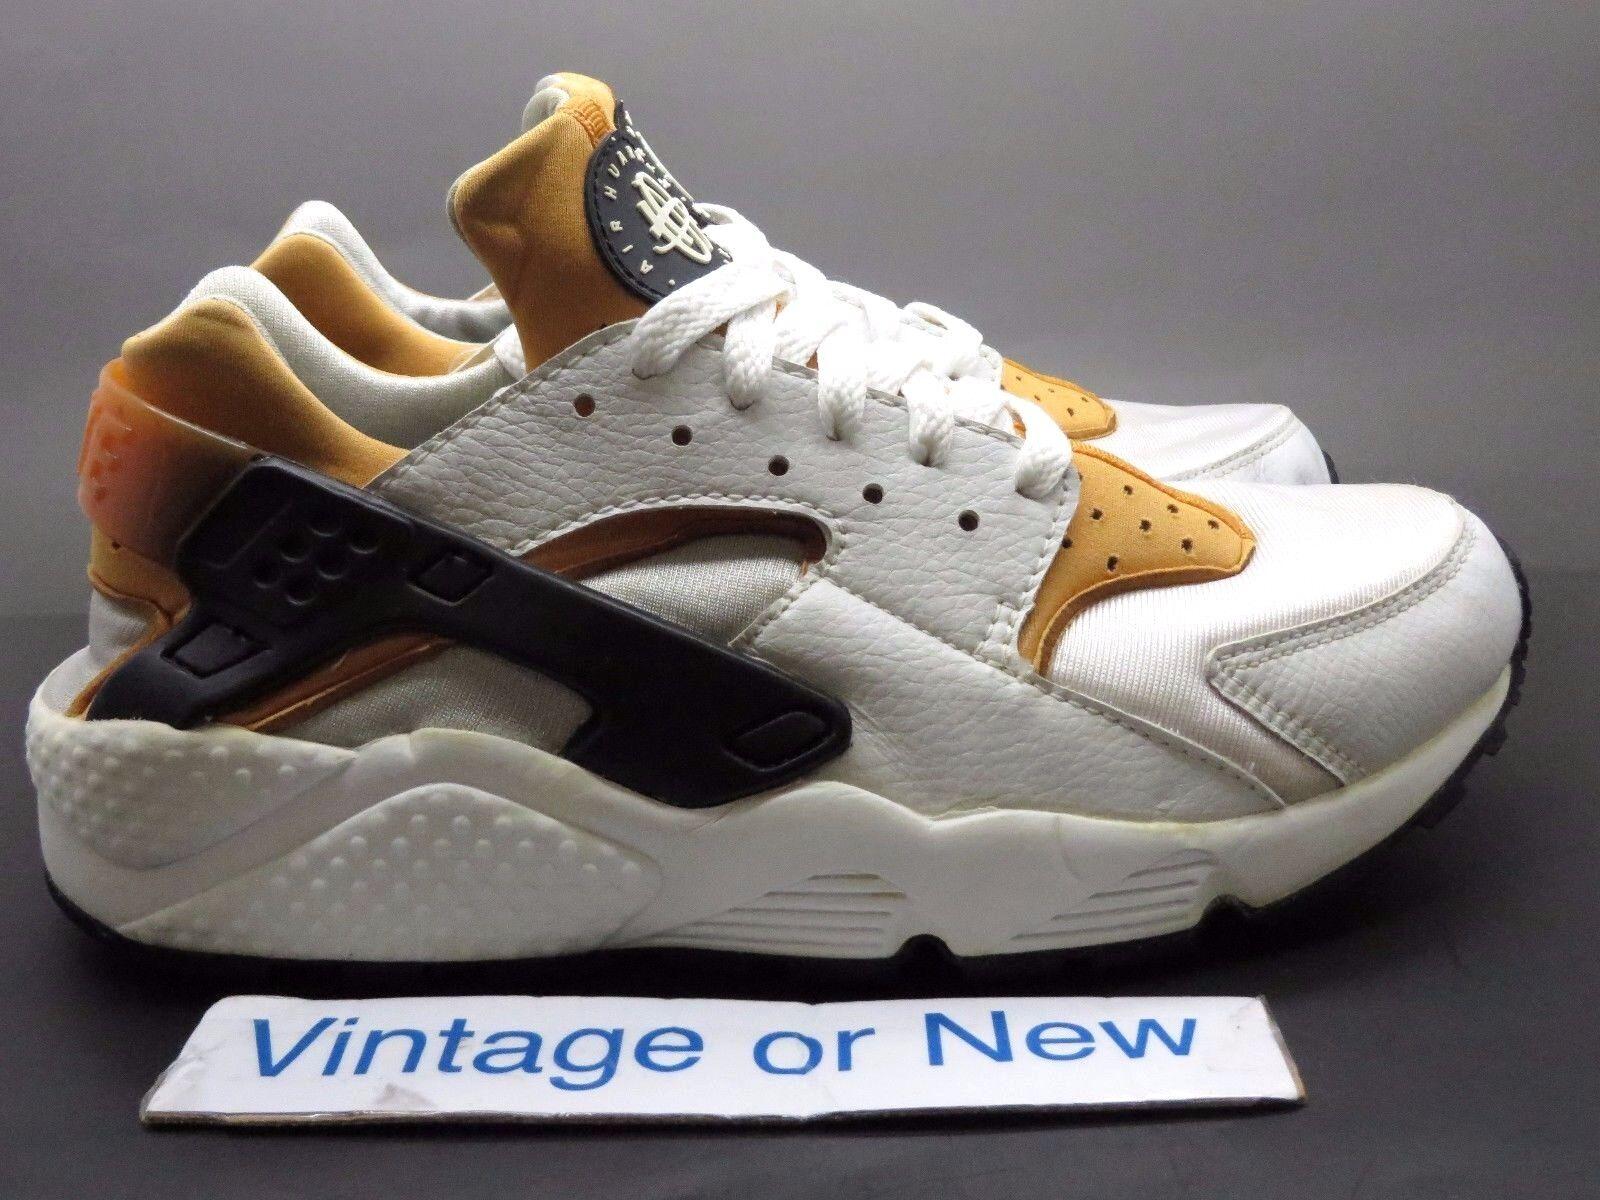 Women's VTG Nike Air Huarache LE Melon 2000 sz 10 Men's sz 8.5